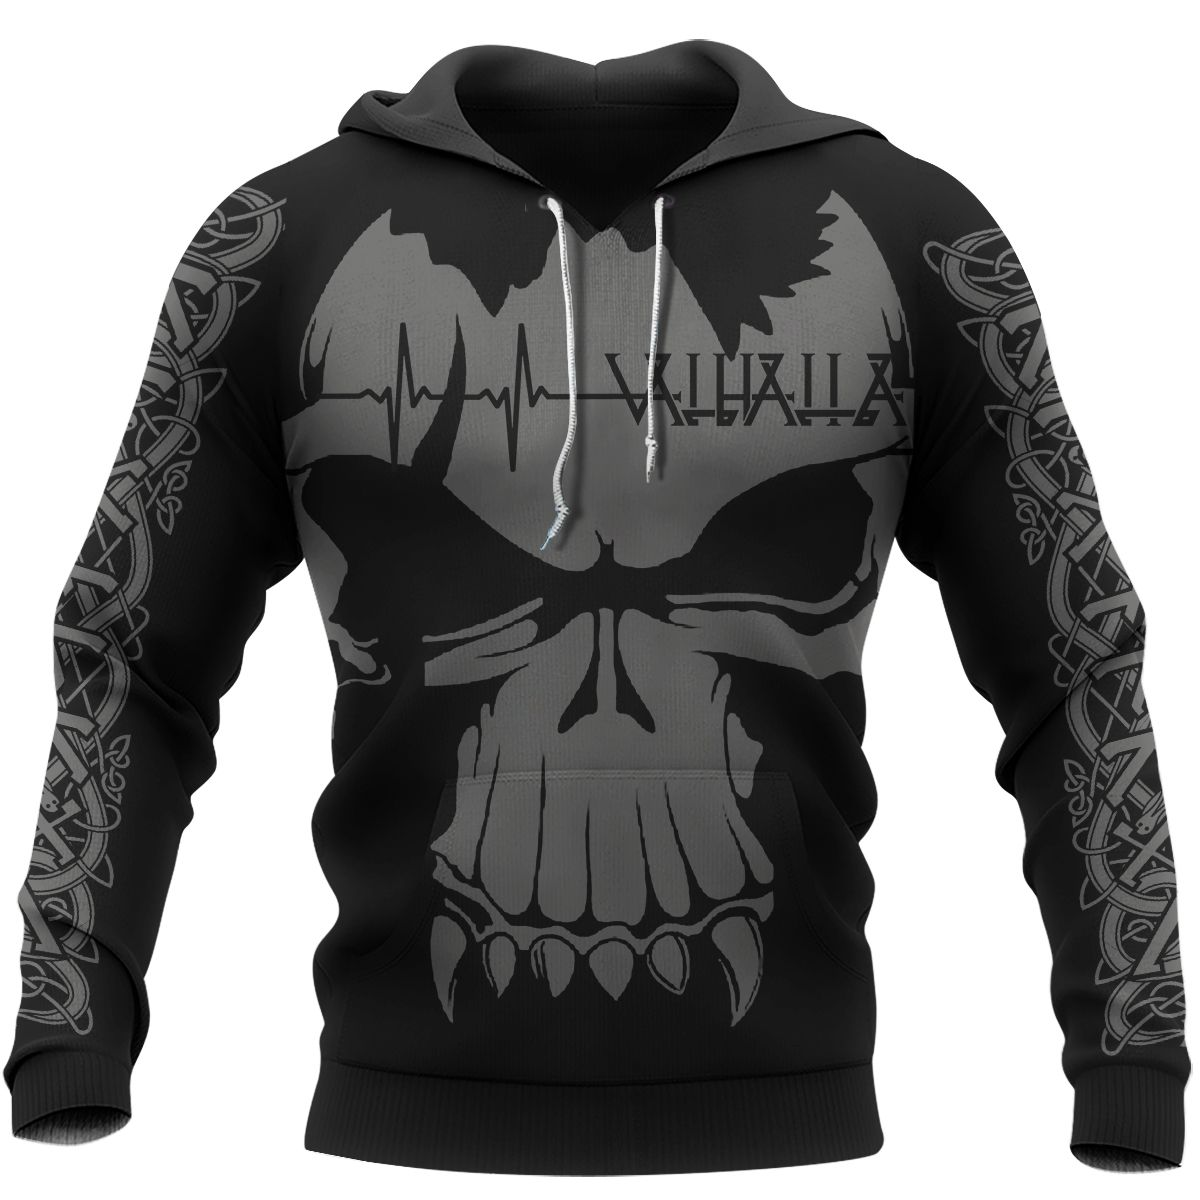 Viking Valhalla Valknut Skull Hoodie Black 3D